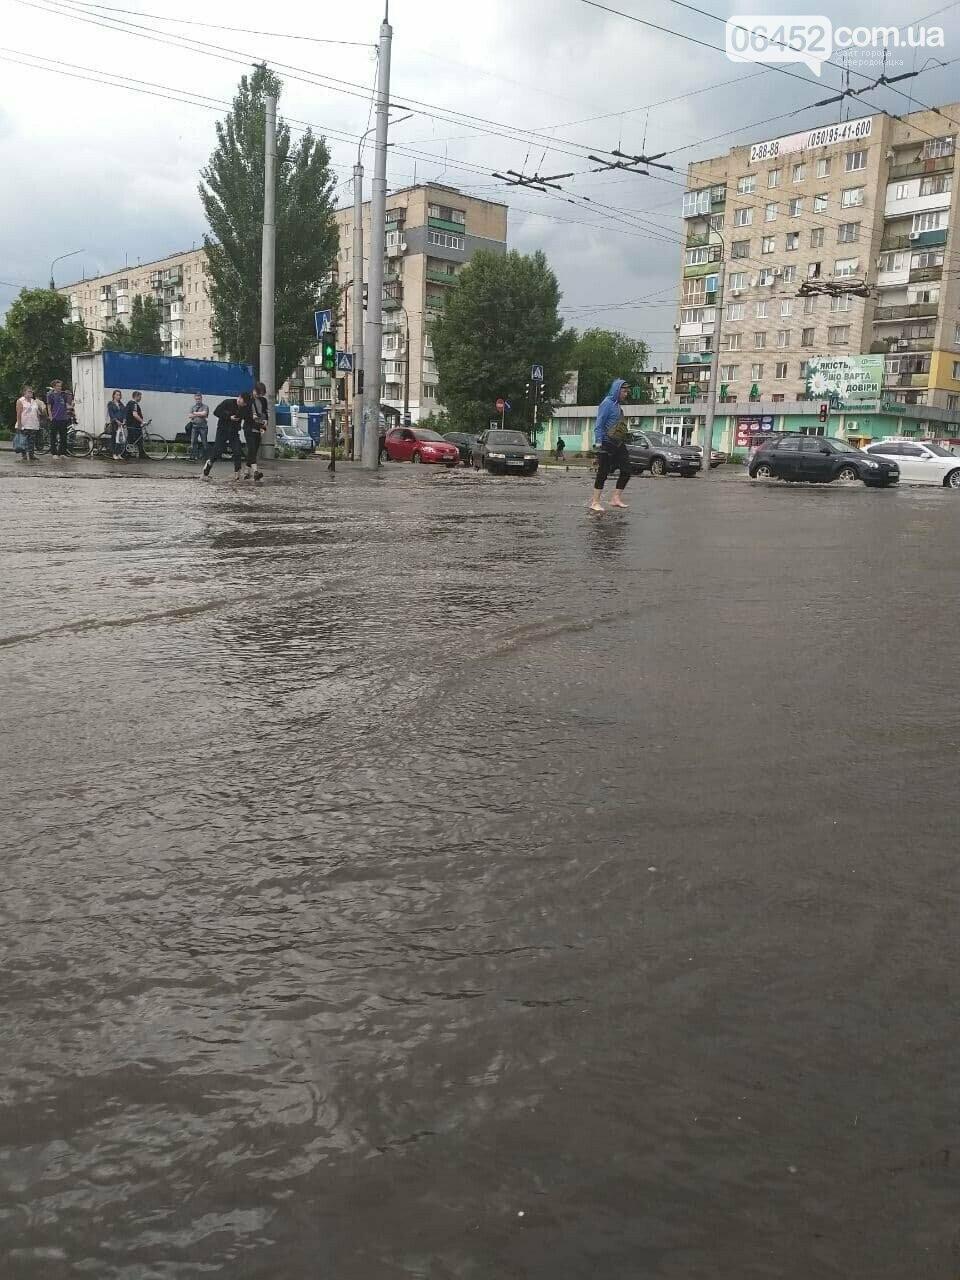 Потоп в квартирах и река в торговом центре: последствия ливня в Северодонецке (фото, видео) , фото-1